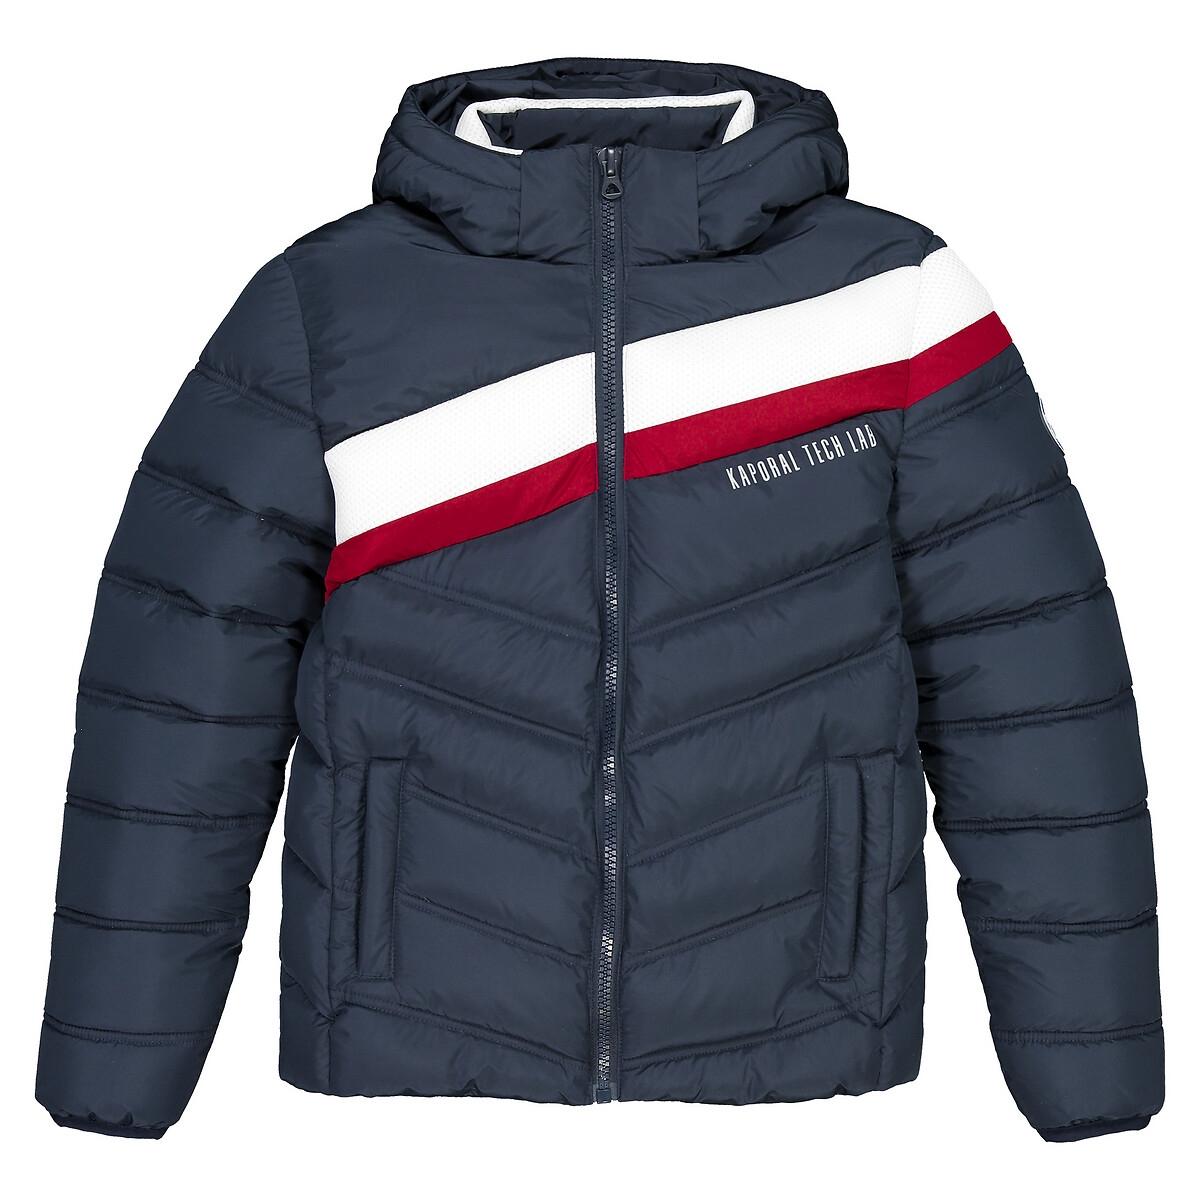 Куртка La Redoute Со съемным капюшоном 10-16 лет 16 лет - 174 см синий куртка la redoute тонкая непромокаемая maxime xxl синий